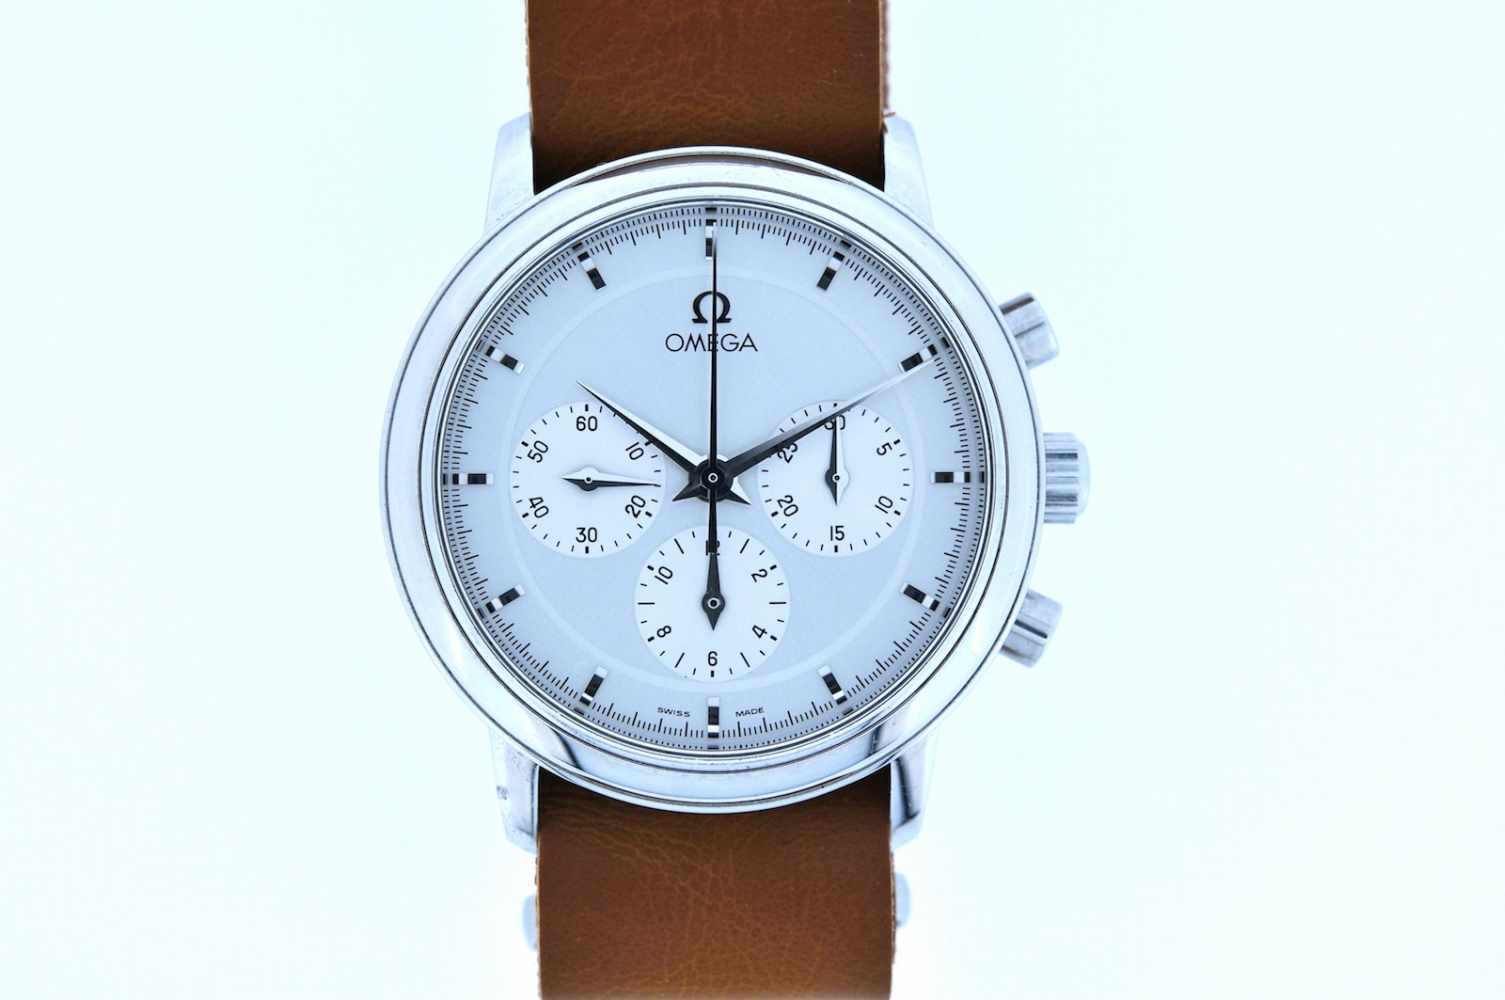 Omega Edelstahl Armbanduhr an Lederband, Omega, Chronograph, Stoppfunktion, Kaliber 861, Handaufzug, - Bild 2 aus 2